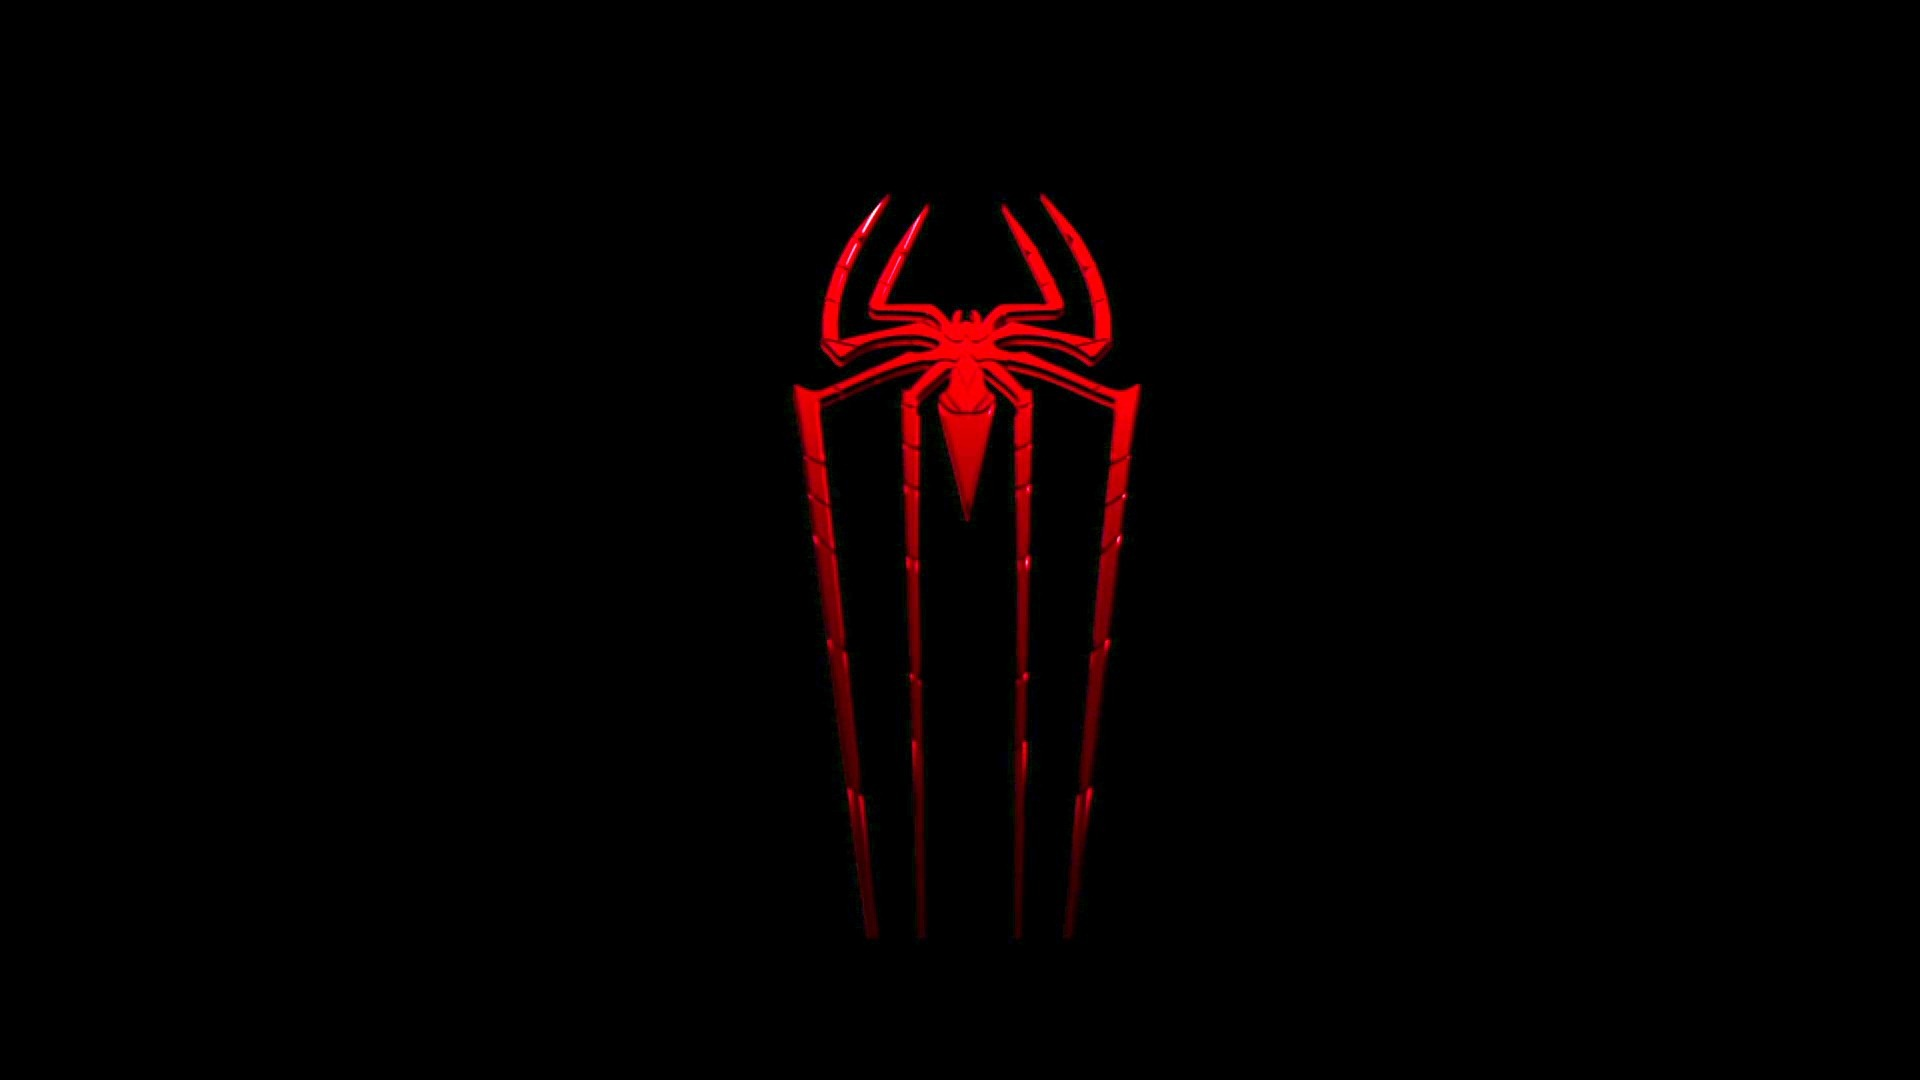 wallpaper spiderman wallpapers logo 1920x1080 1920x1080